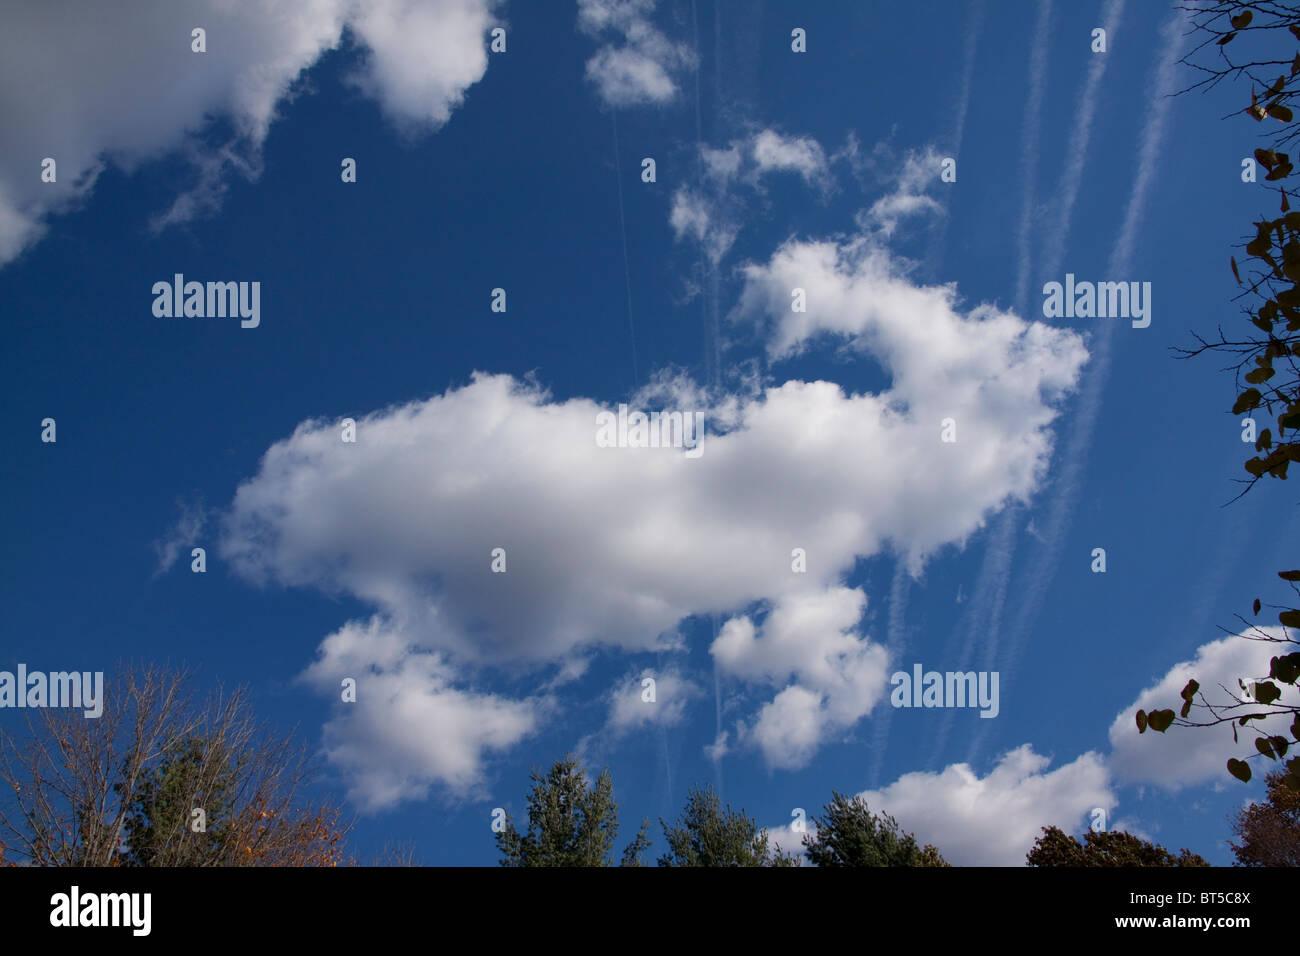 artificial floating float adrift drifting streak streaks pattern patterns mediocris vista vistas moving movement - Stock Image